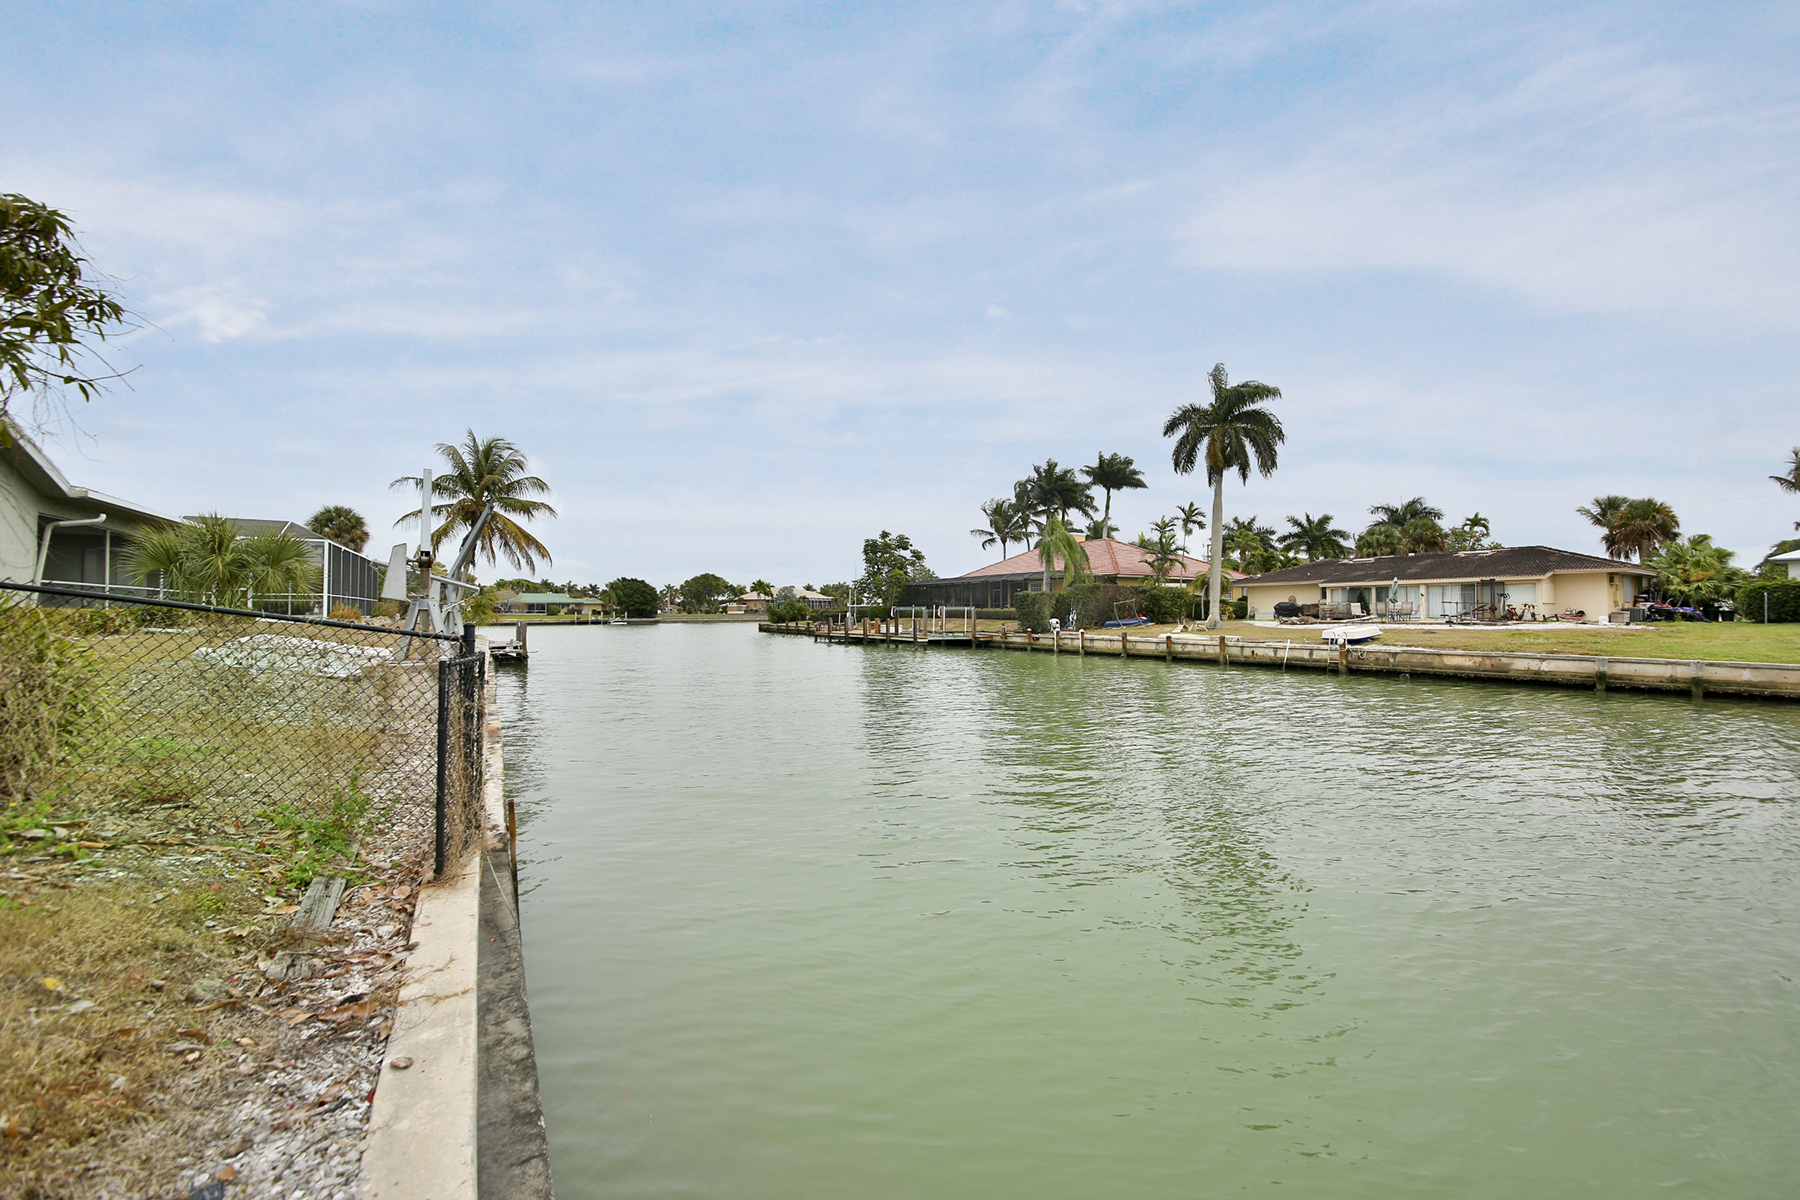 土地 为 销售 在 MARCO ISLAND - WAIKIKI COURT 1355 Waikiki Ct Marco Island, 佛罗里达州 34145 美国